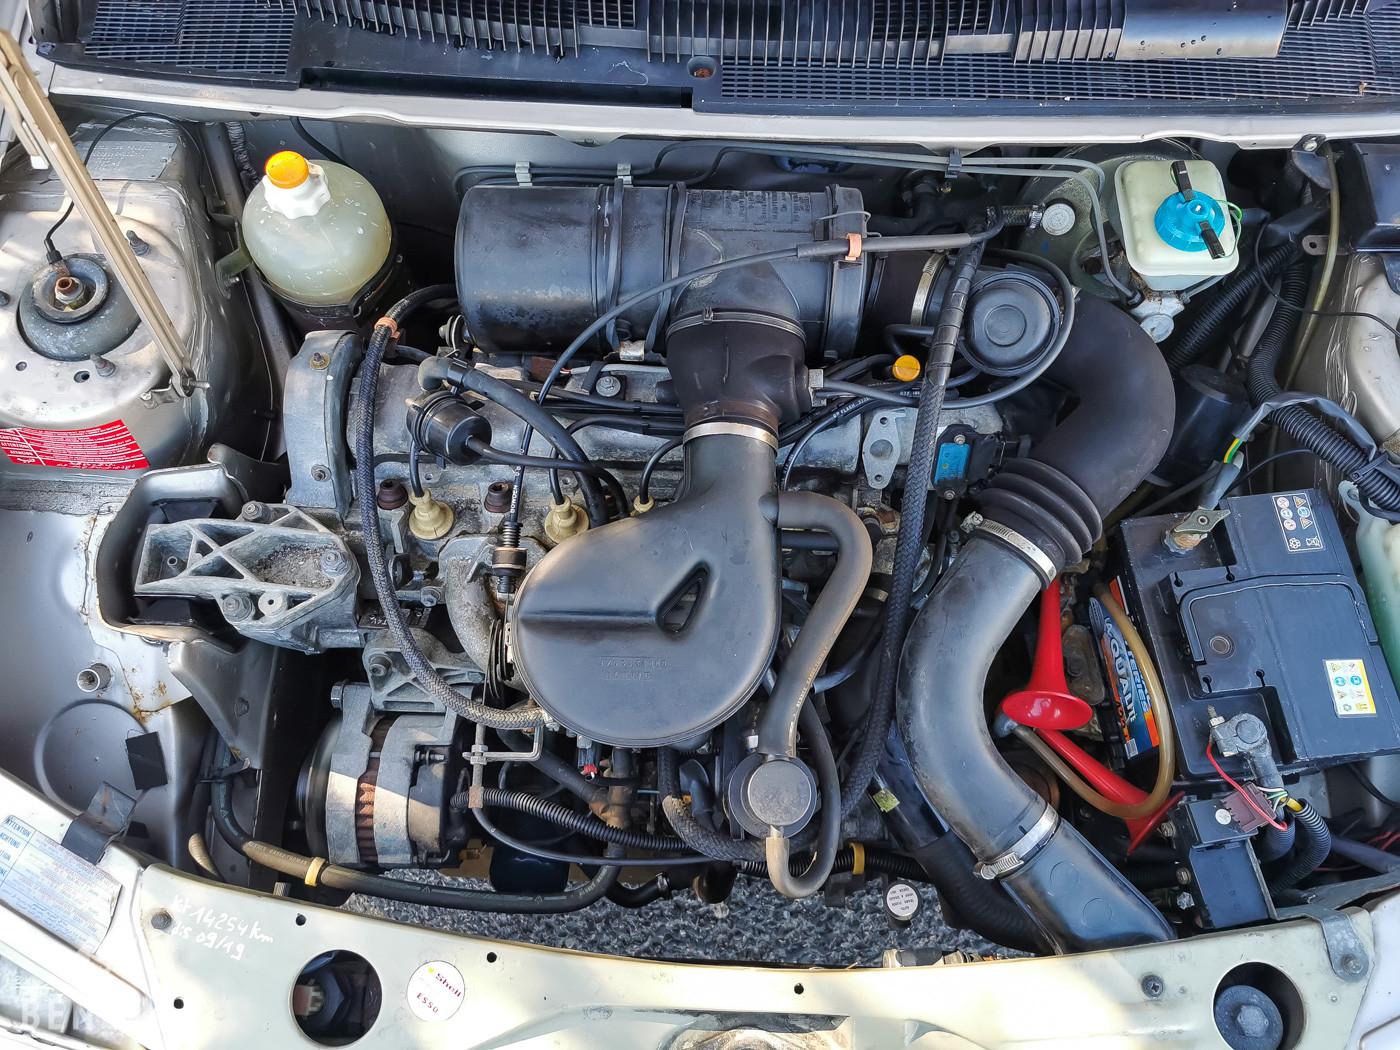 Peugeot 205 Automatic occasion à vendre for sale te koop zu verkaufen neuve new se vende